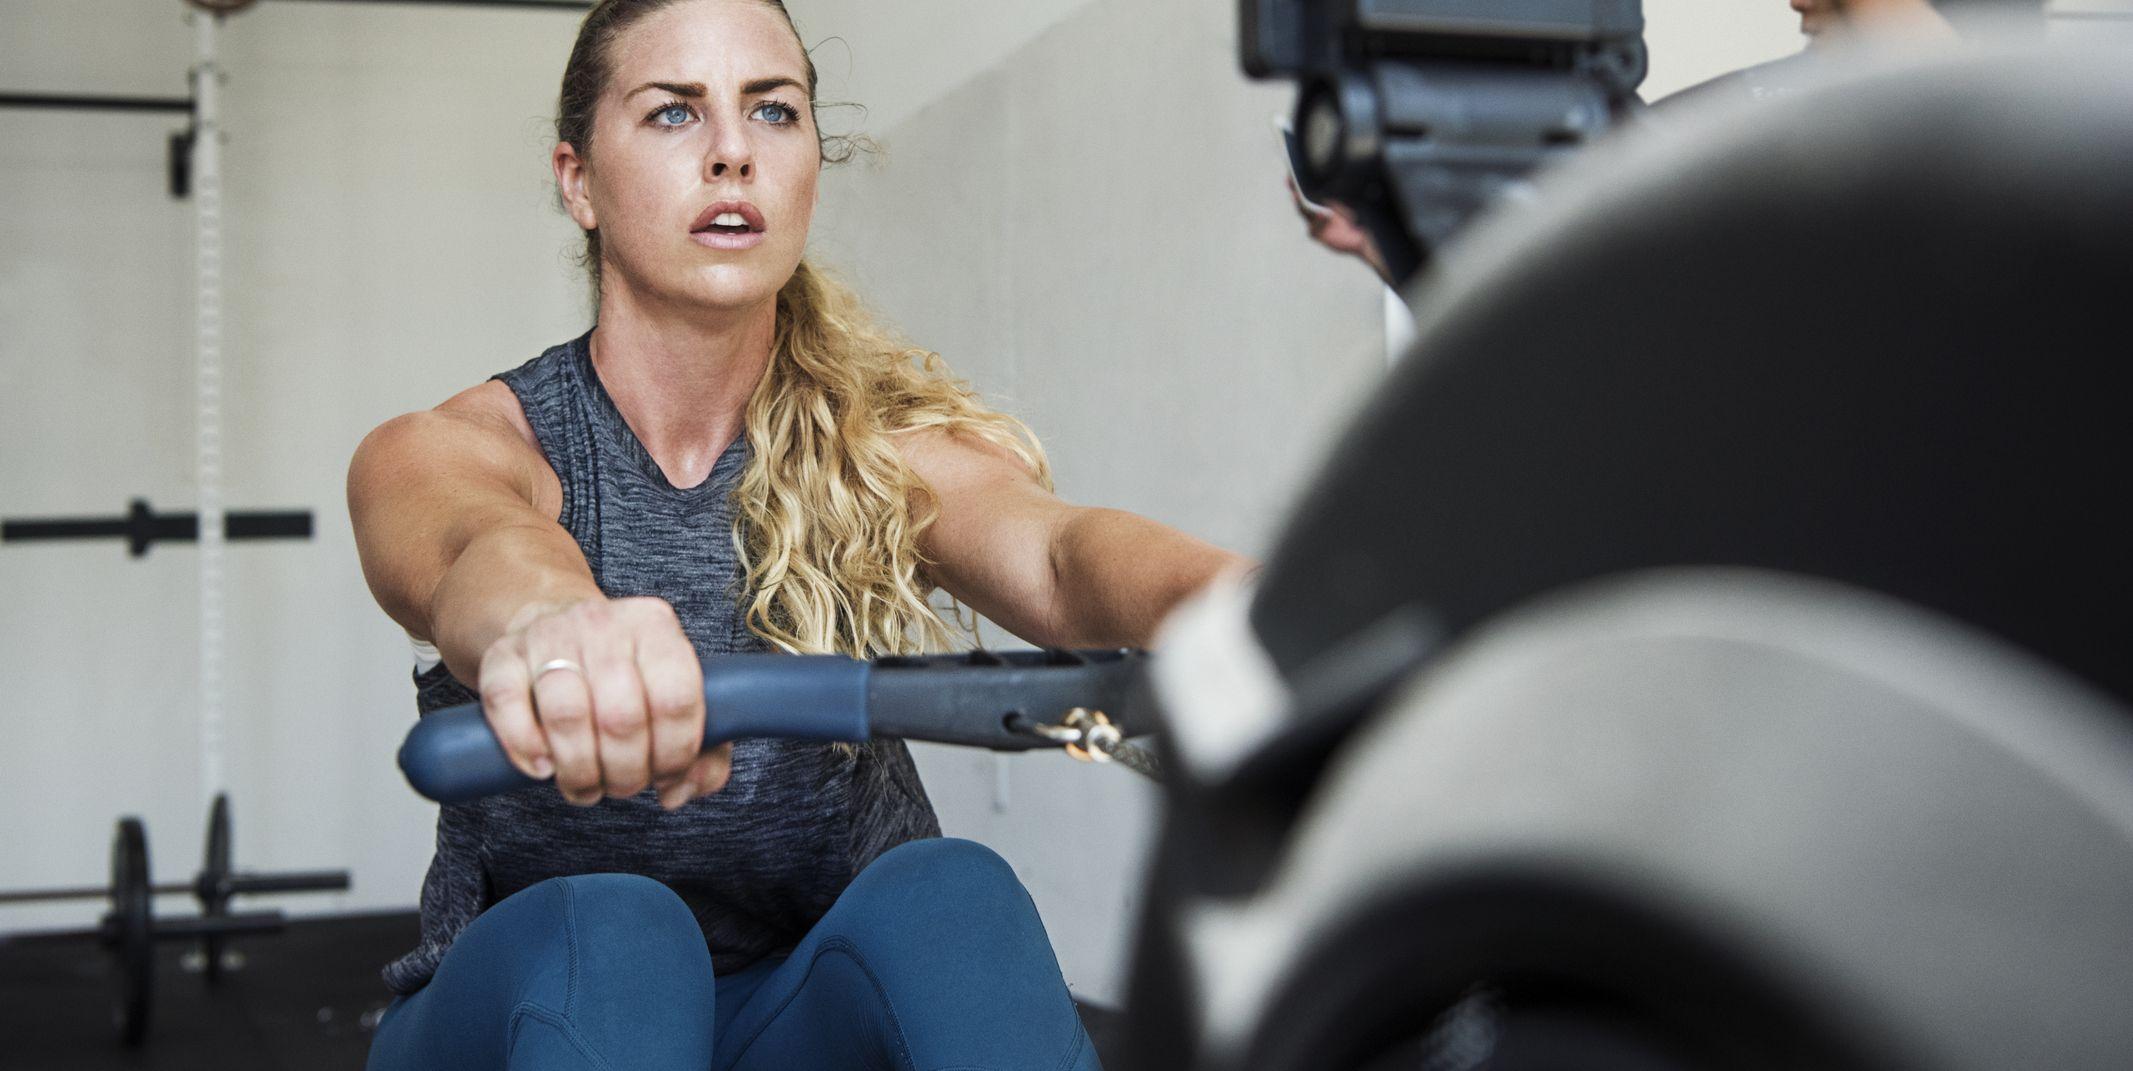 Focused athlete exercising on rowing machine in crossfit gym